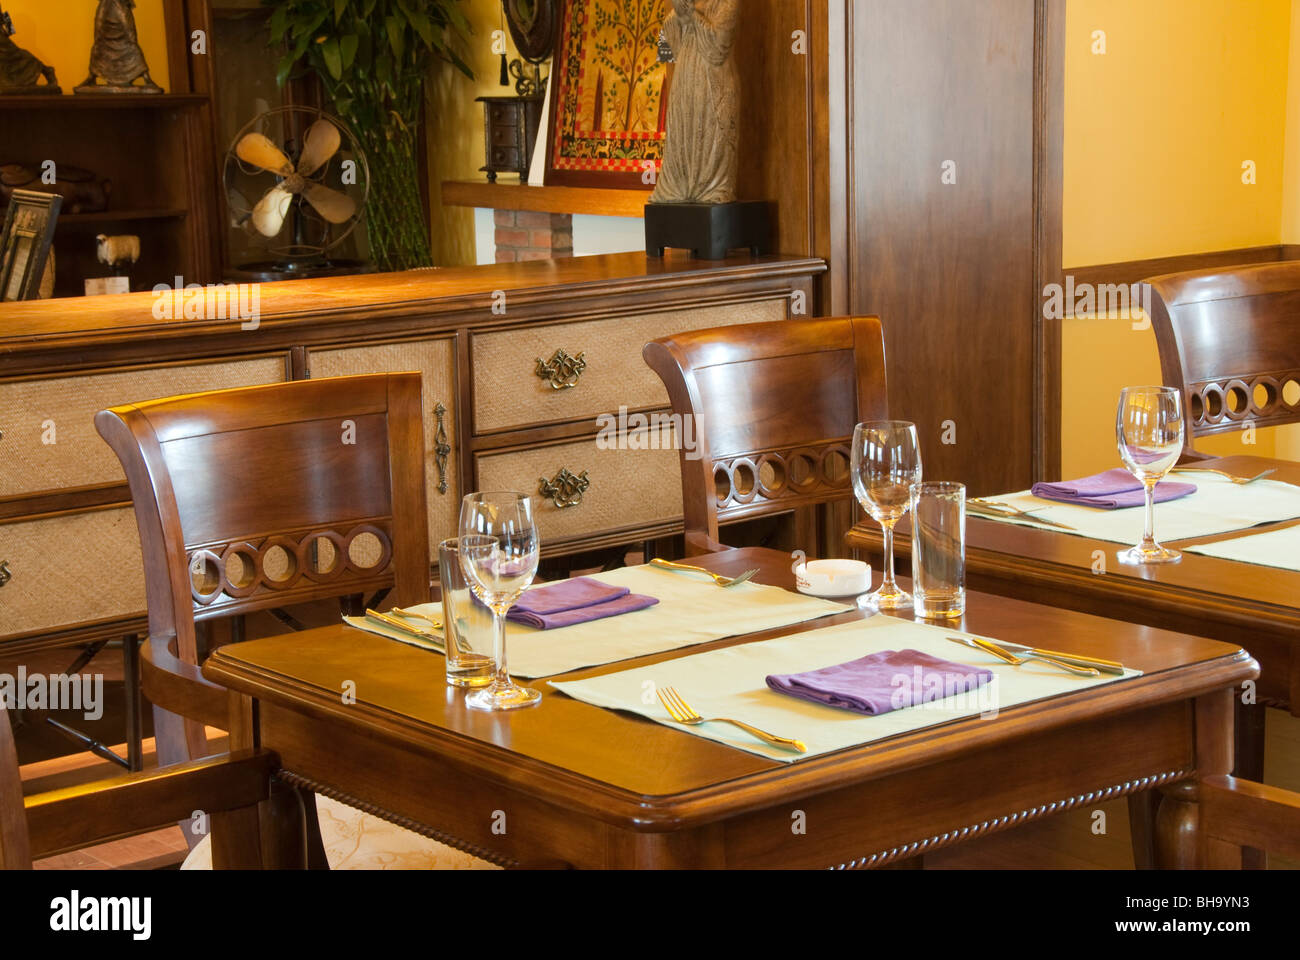 Beijing, CHINA- Interior Design, Dining Room of French-Vietnamese Restaurant,'La Maison de Marquerite' - Stock Image